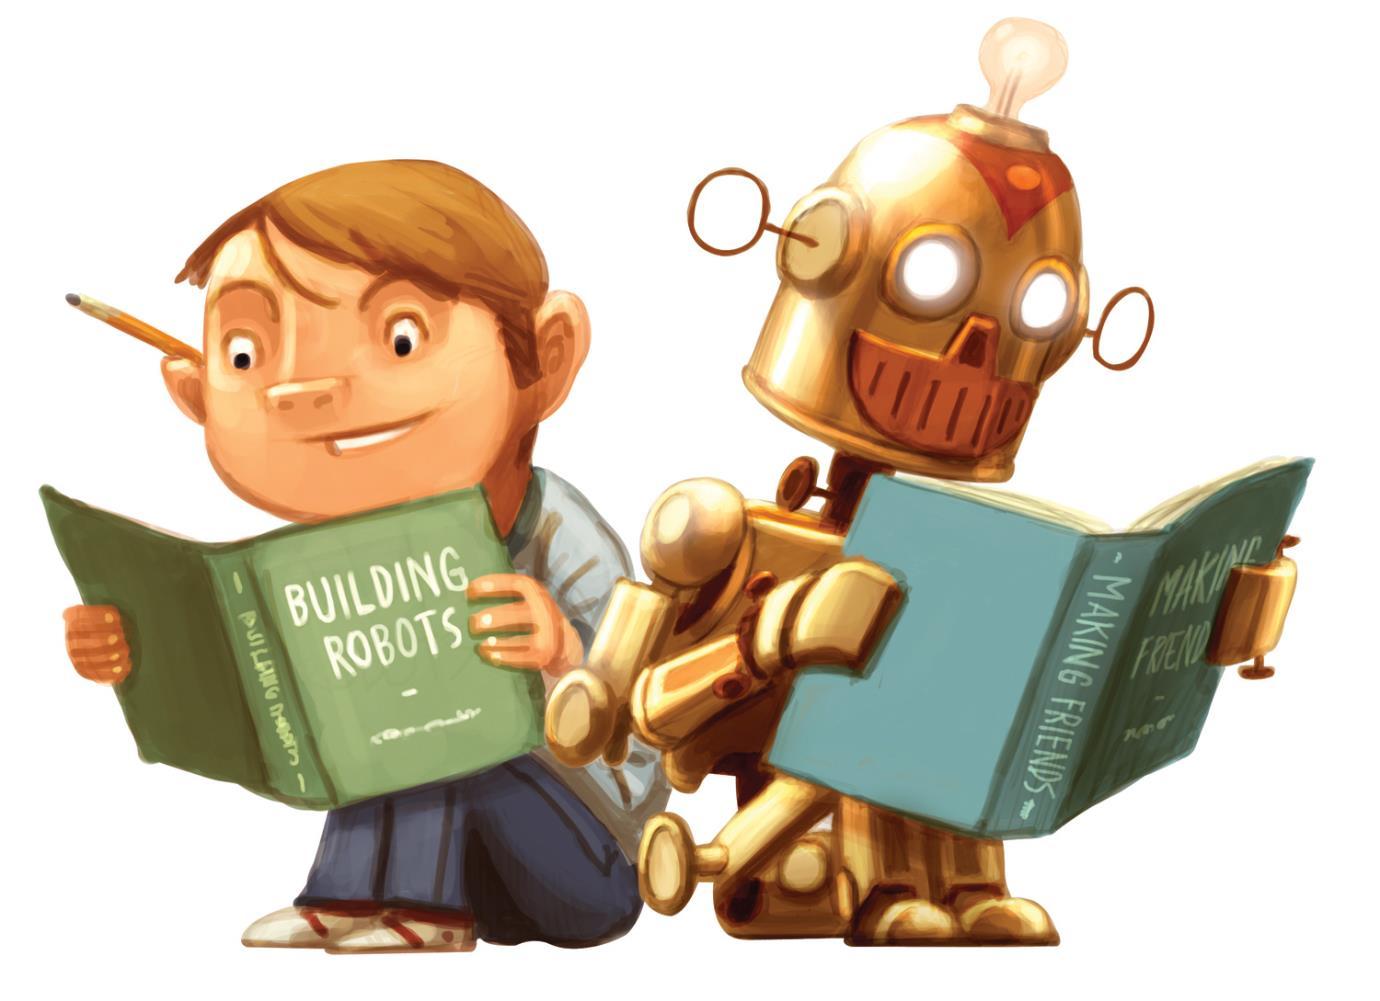 Robotandboy